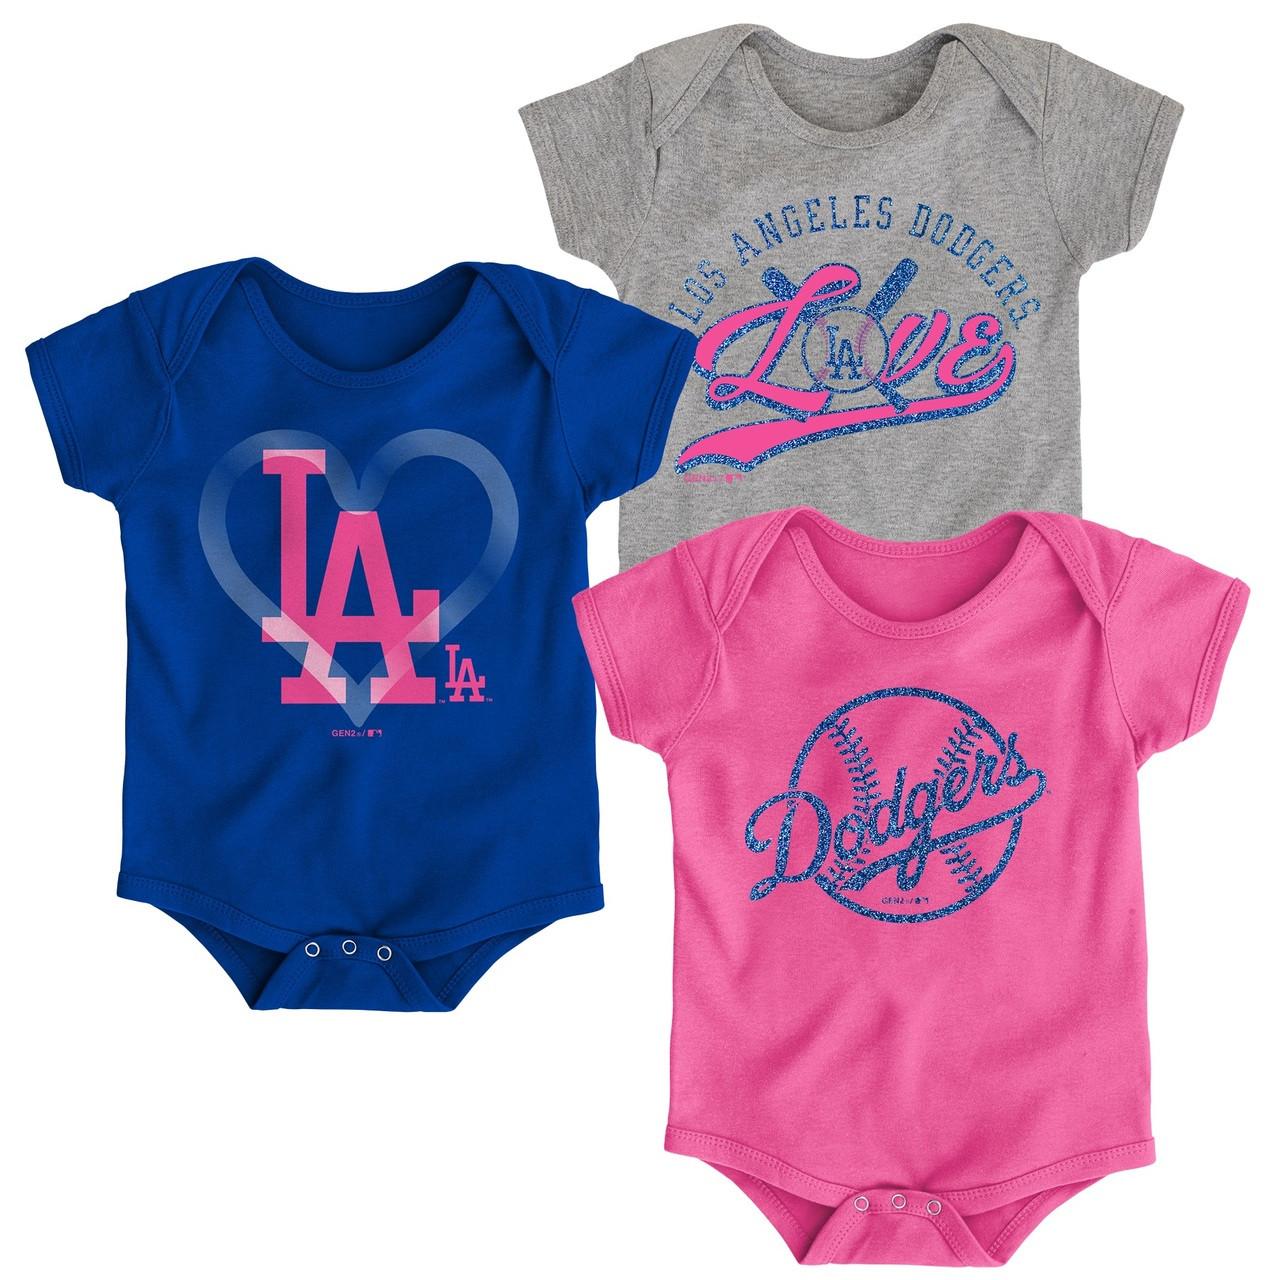 de307ba1 Los Angeles Dodgers Girls Pink Toddler 3-Pack Baby Onesie Bodysuit Creeper  Set